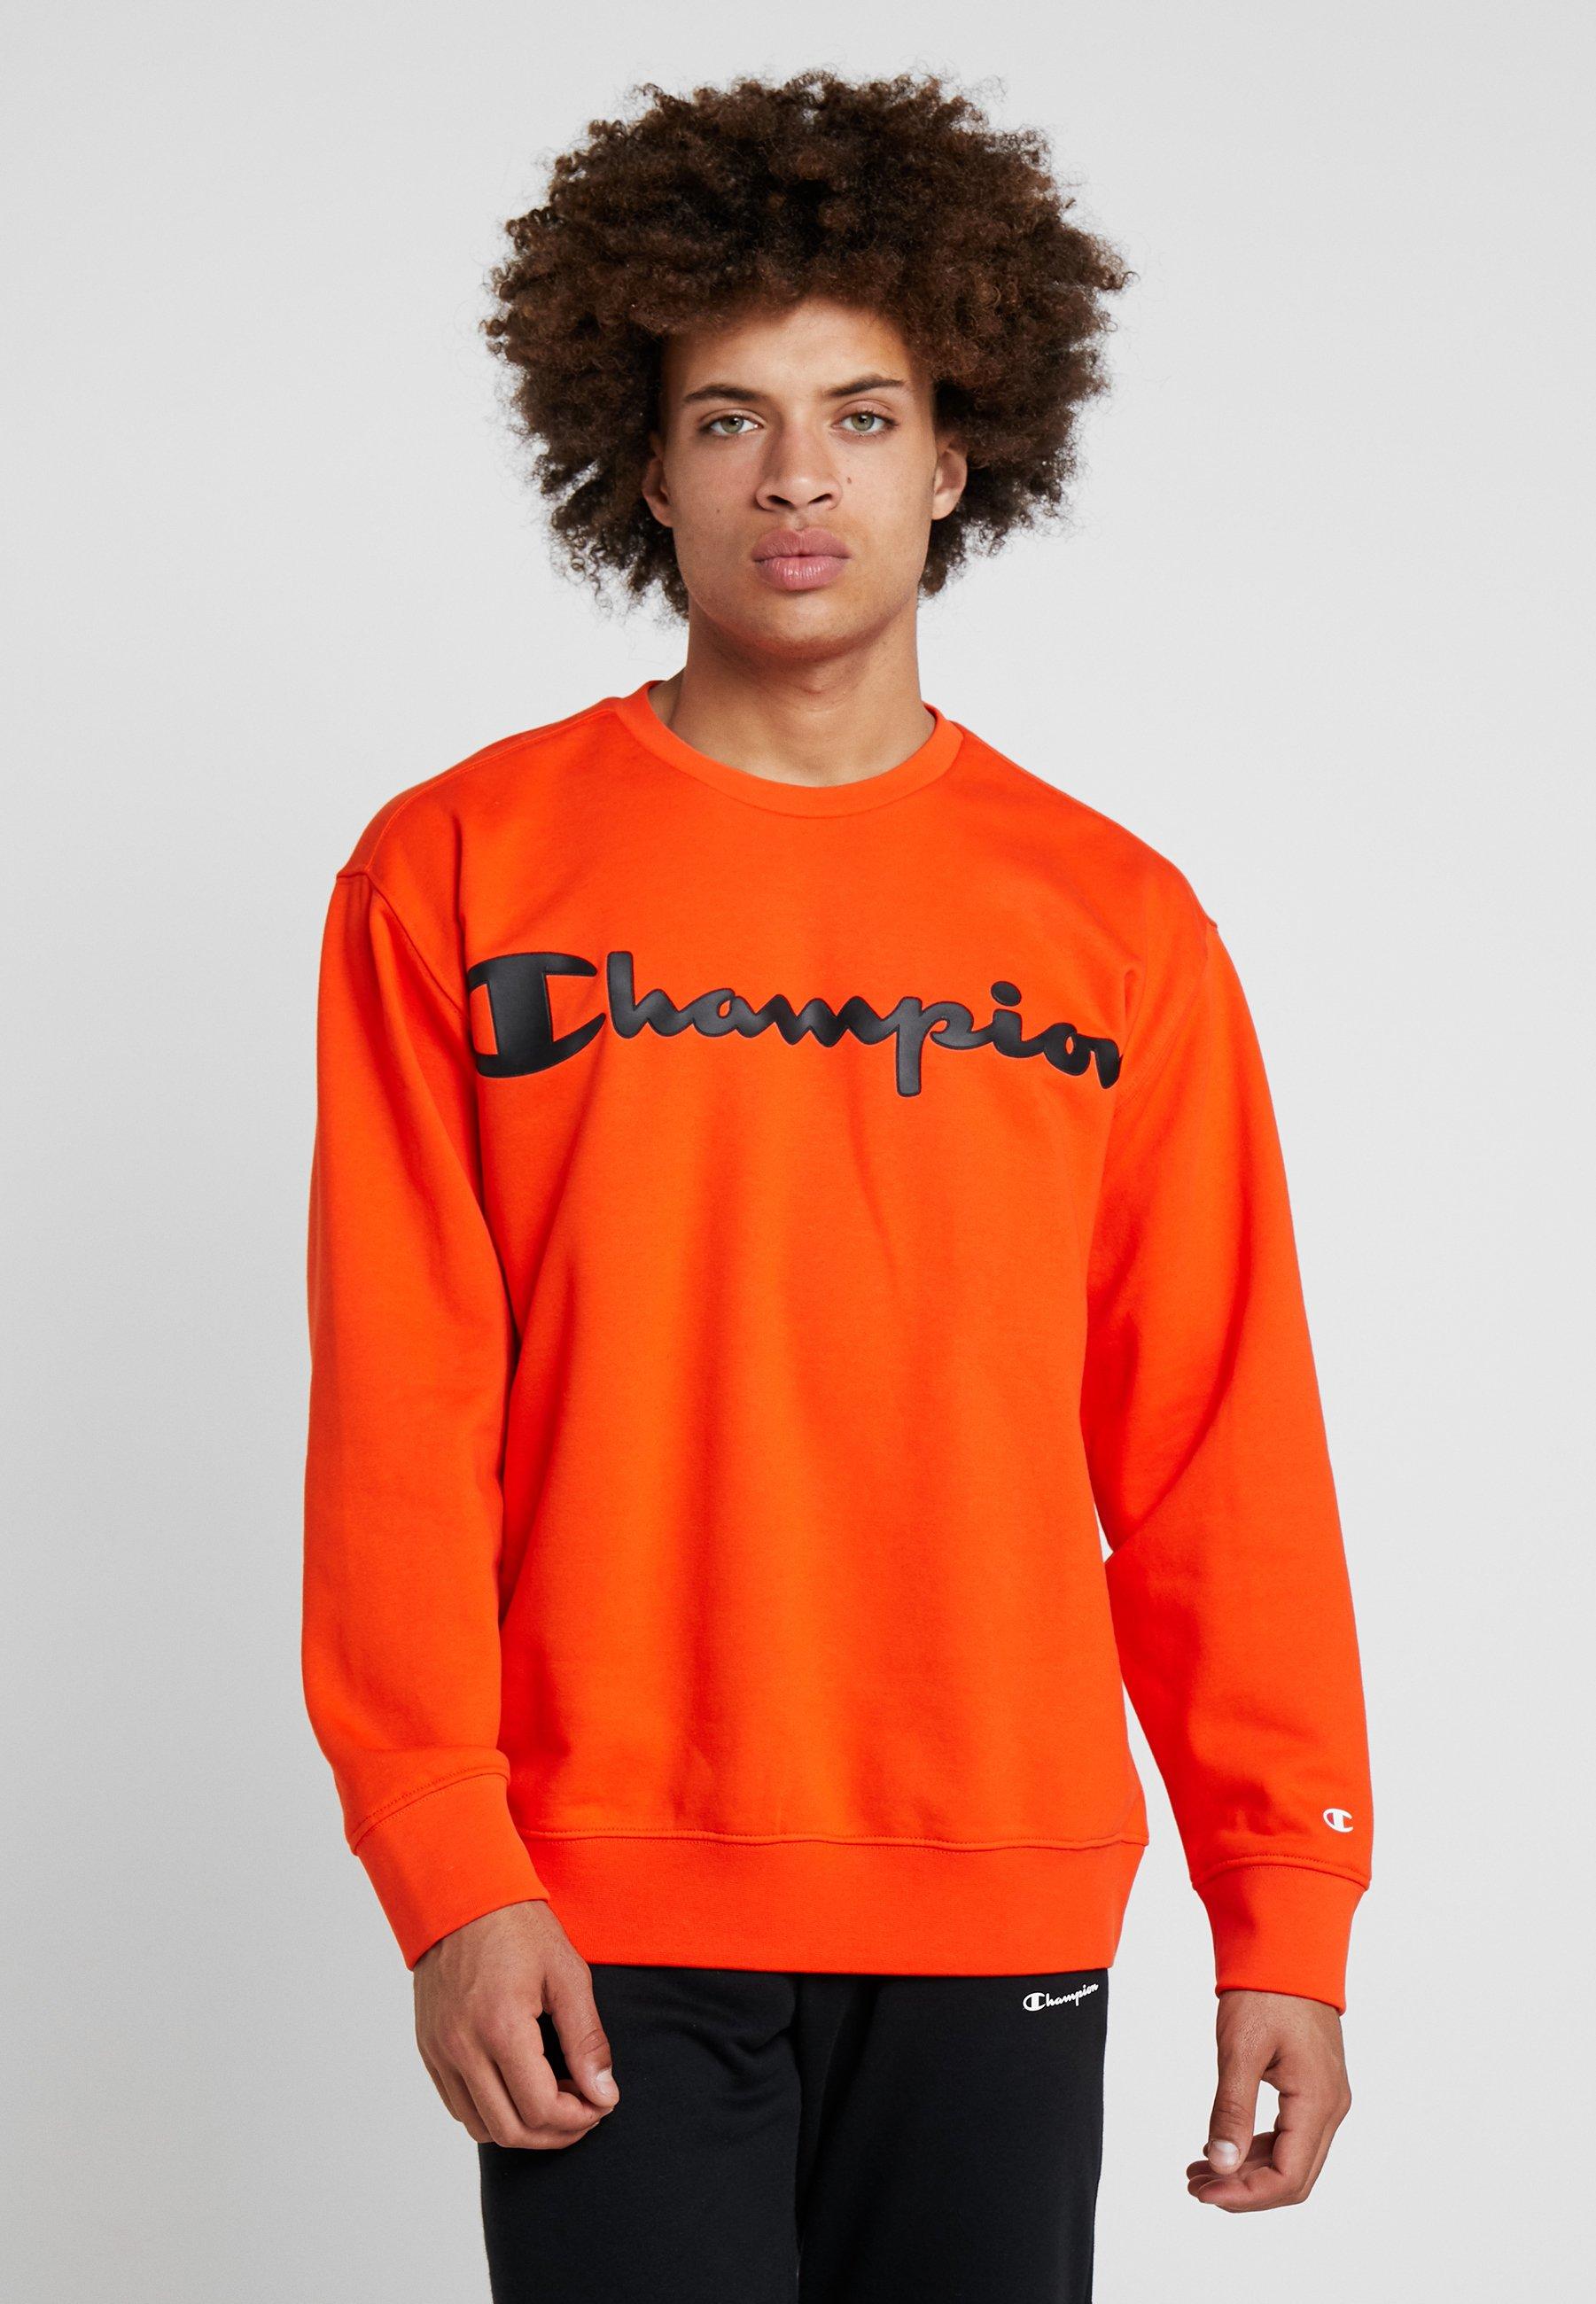 Orange Champion Orange Champion CrewneckSweatshirt Champion Champion CrewneckSweatshirt CrewneckSweatshirt CrewneckSweatshirt Orange Orange CrewneckSweatshirt Champion Orange Champion hQdCtsr